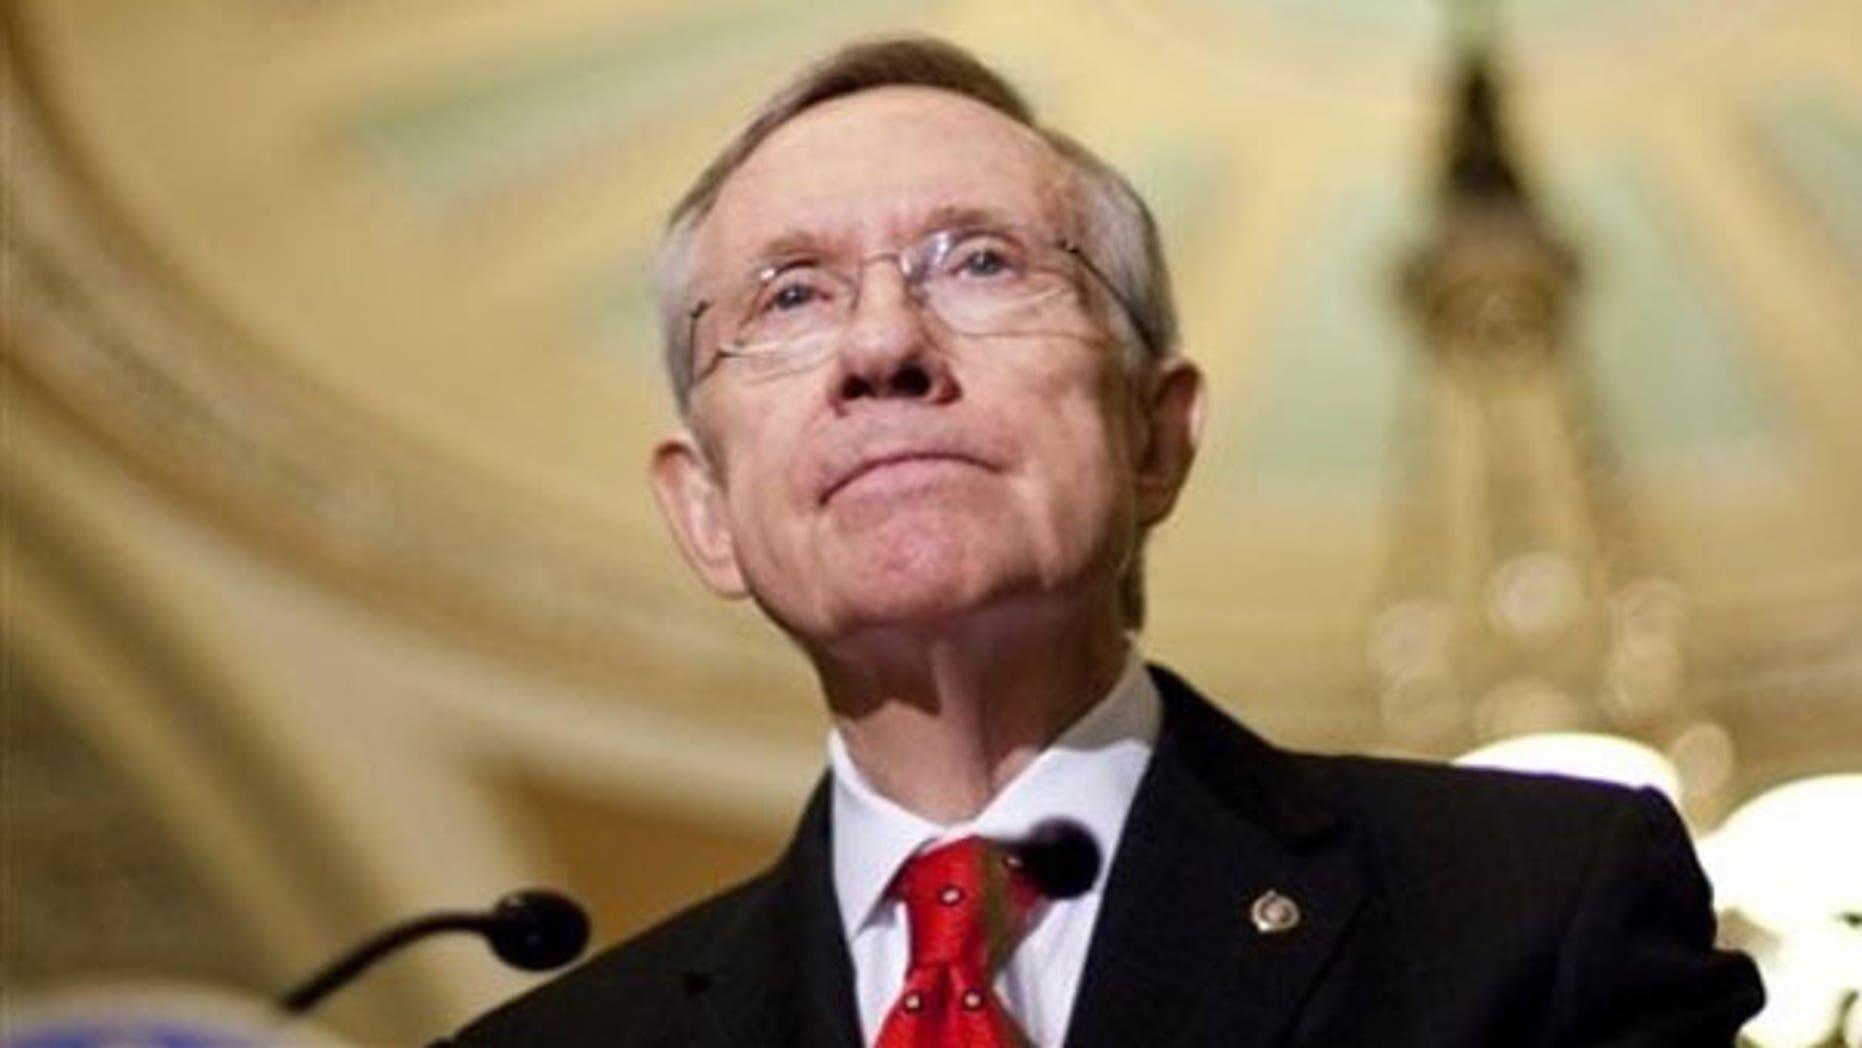 Dec. 6: Senate Majority Leader Harry Reid speaks to the media on Capitol Hill. (AP)